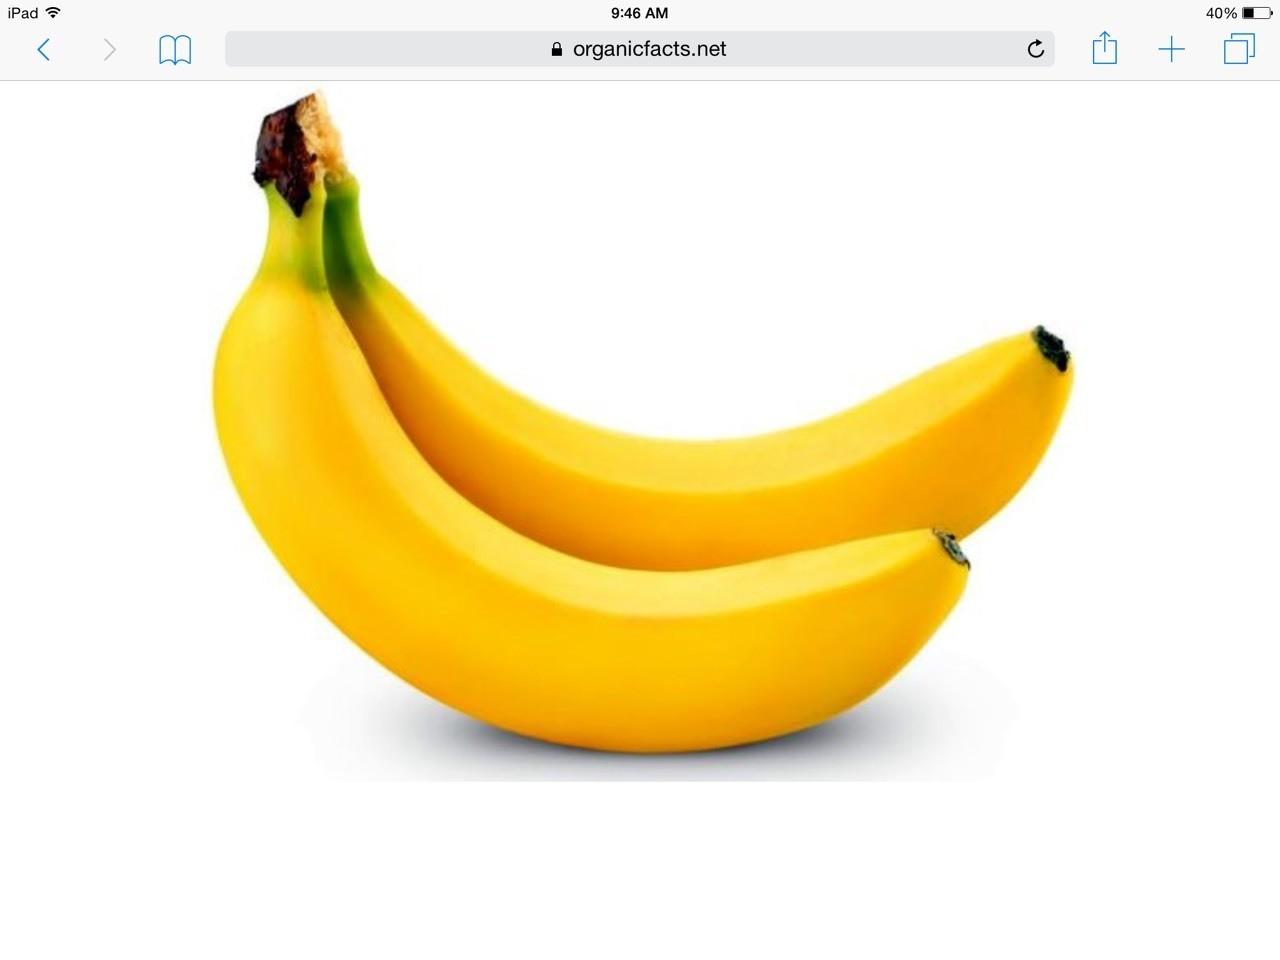 Bananas are yellow!